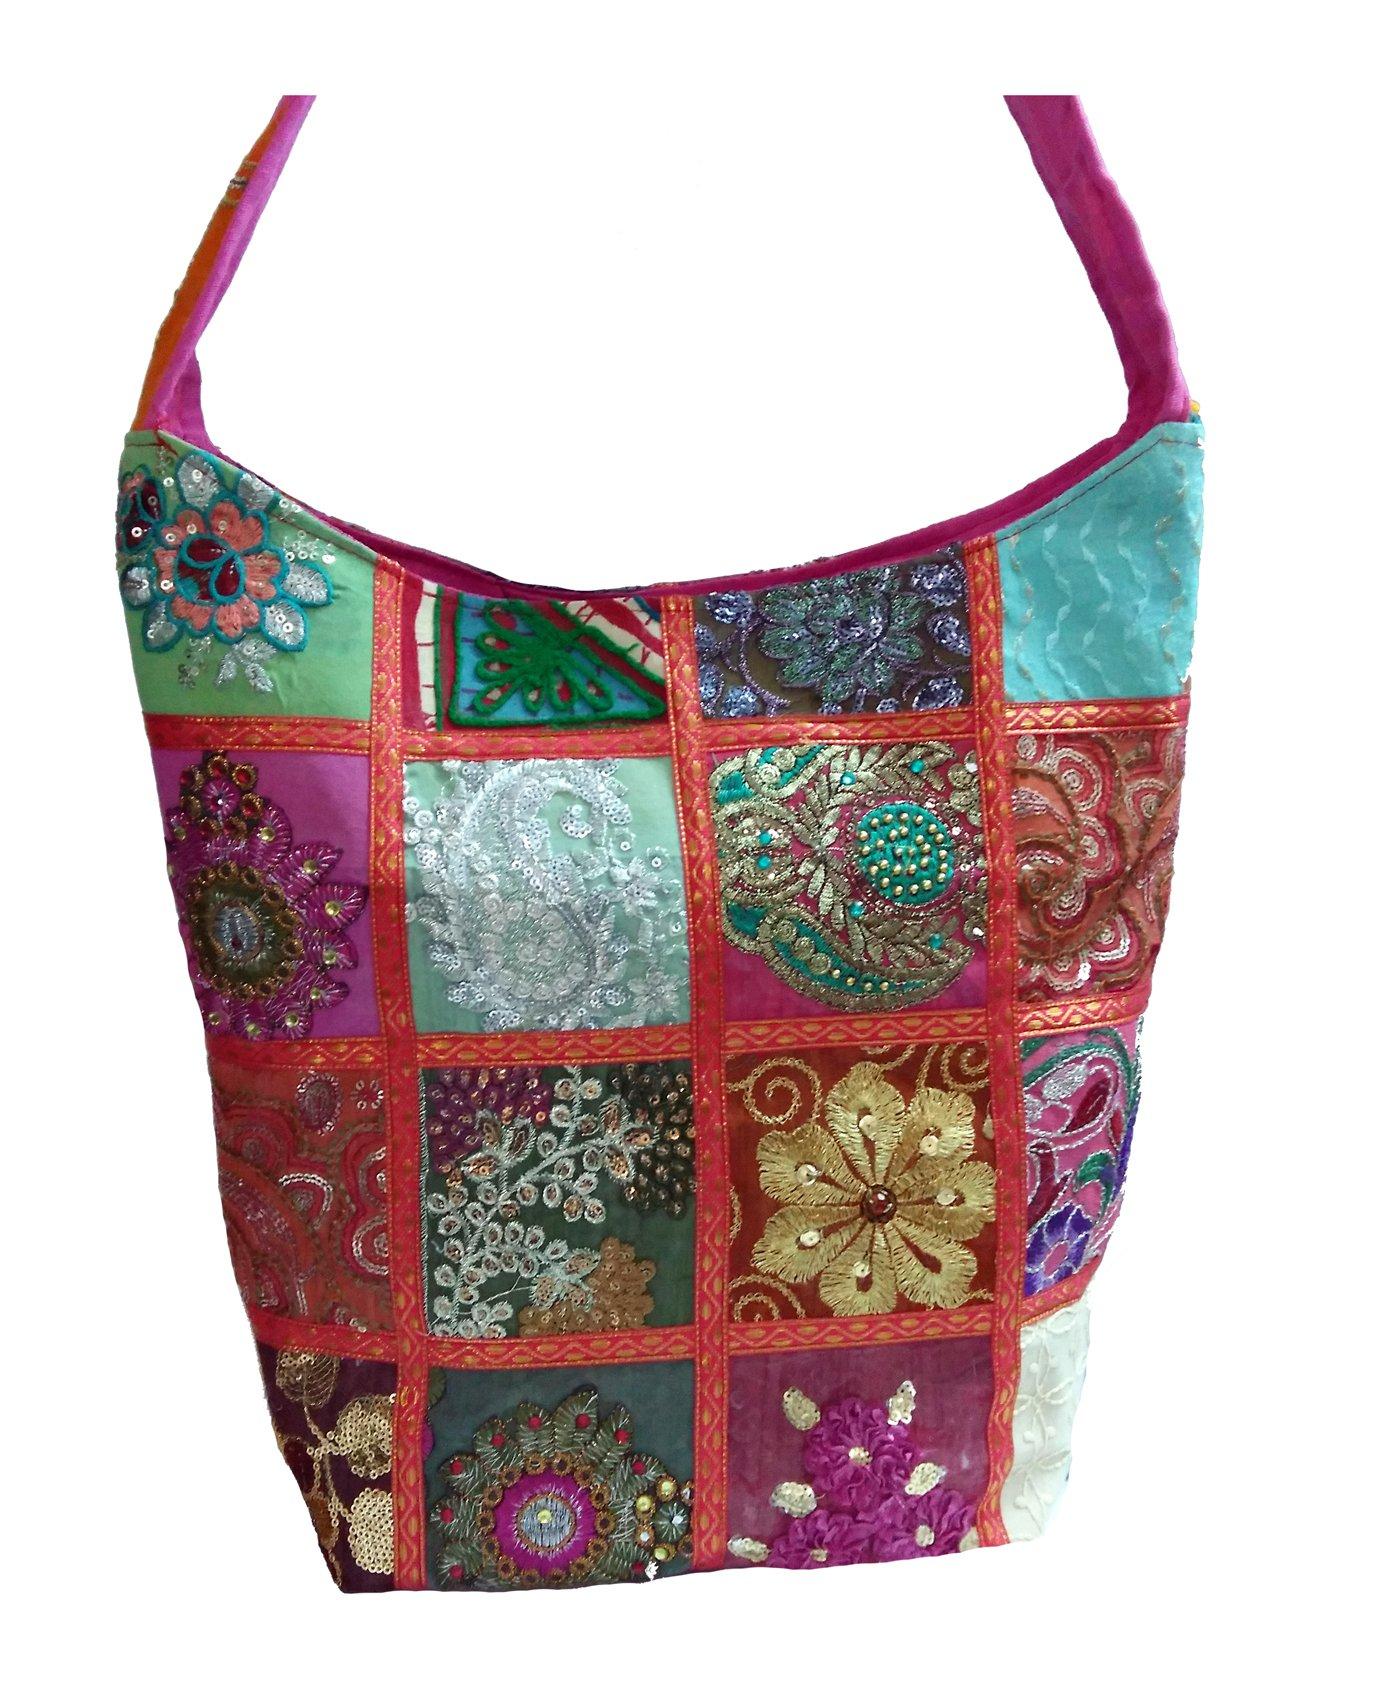 Embroidered Sequin Patchwork Indian Sari Throw Decorative Sling Cross body Shoulder Bag, Boho Hobo Vintage Bag, ''Traditional Looks'' ...